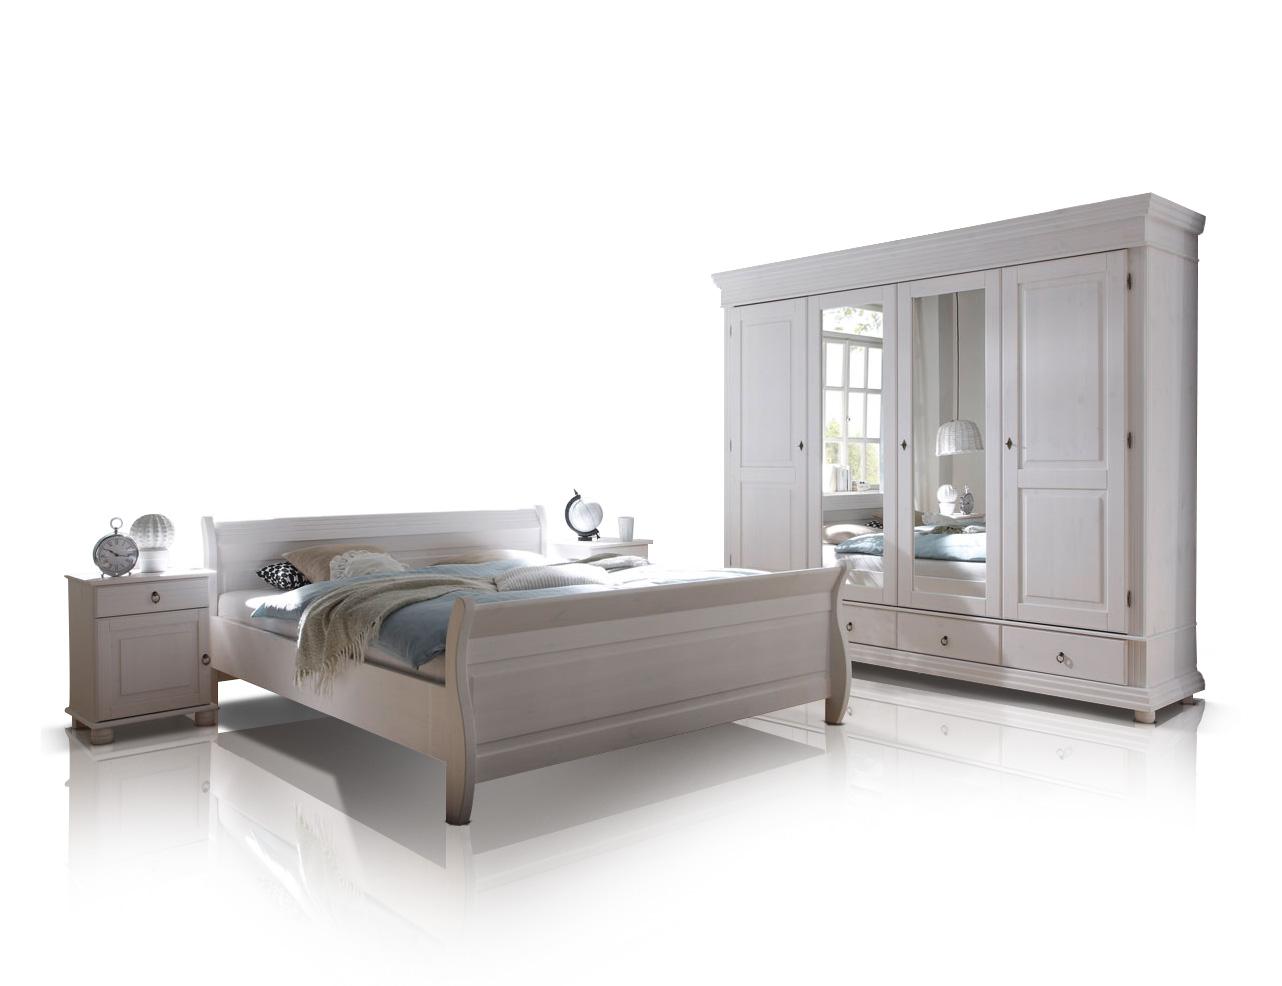 oxford komplett schlafzimmer kiefer wei. Black Bedroom Furniture Sets. Home Design Ideas